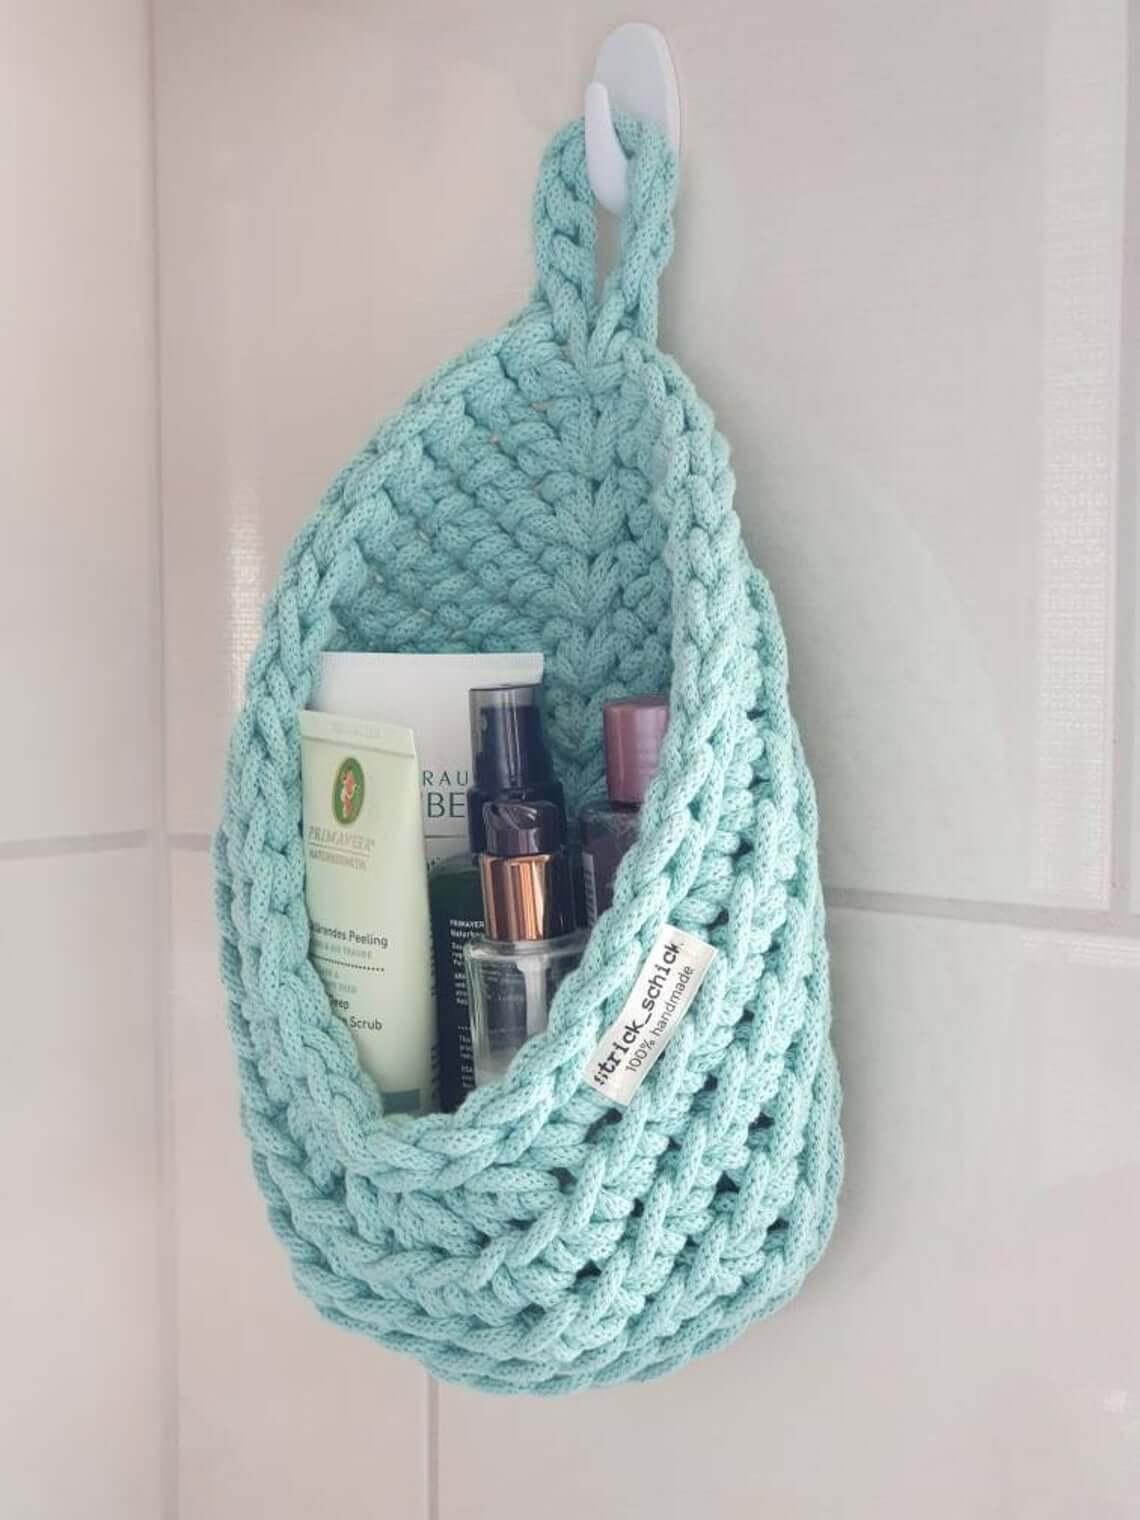 Hanging Crochet Bathroom Organizer Basket